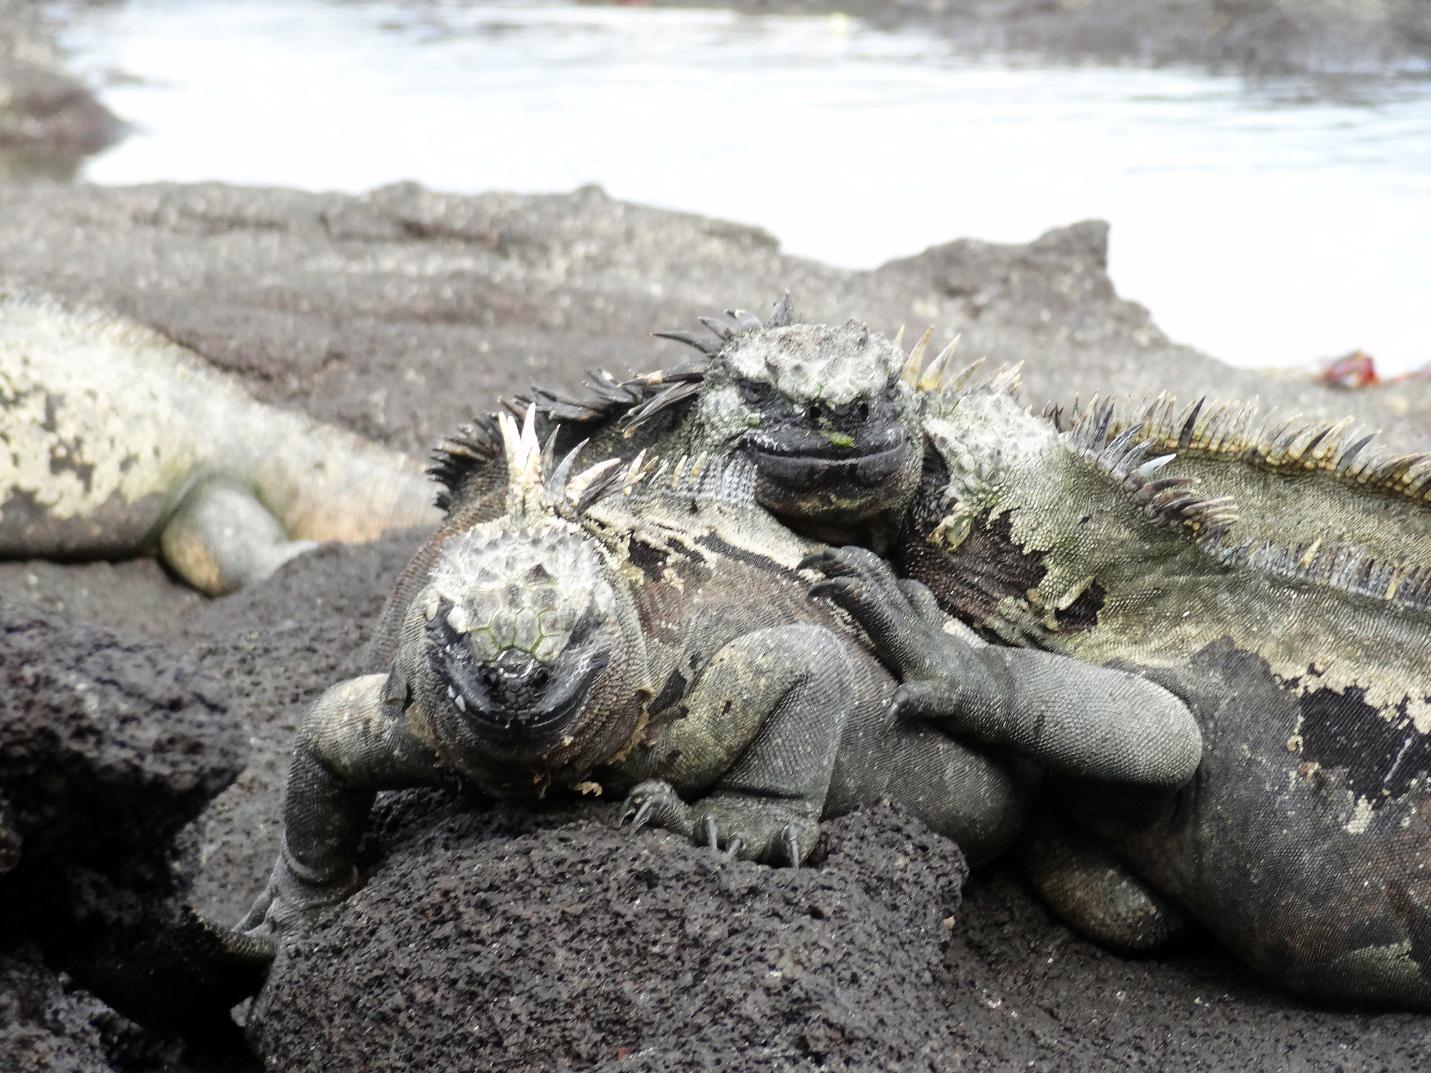 cuddling marine iguanas